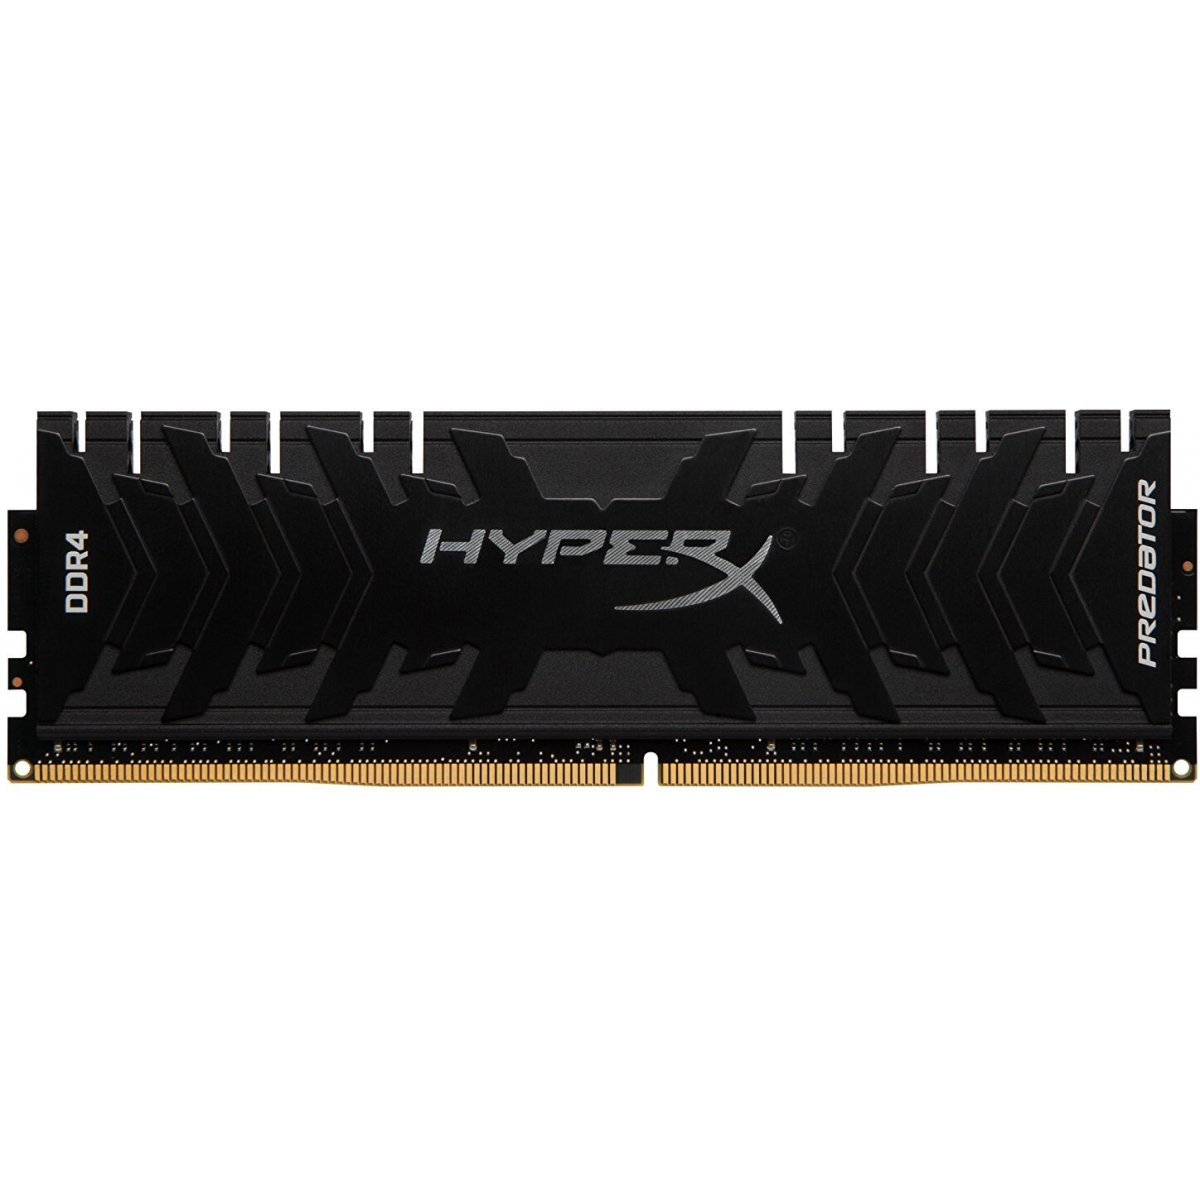 Memória DDR4 Kingston HyperX Predator, 8GB 2666MHZ,  HX426C13PB3/8